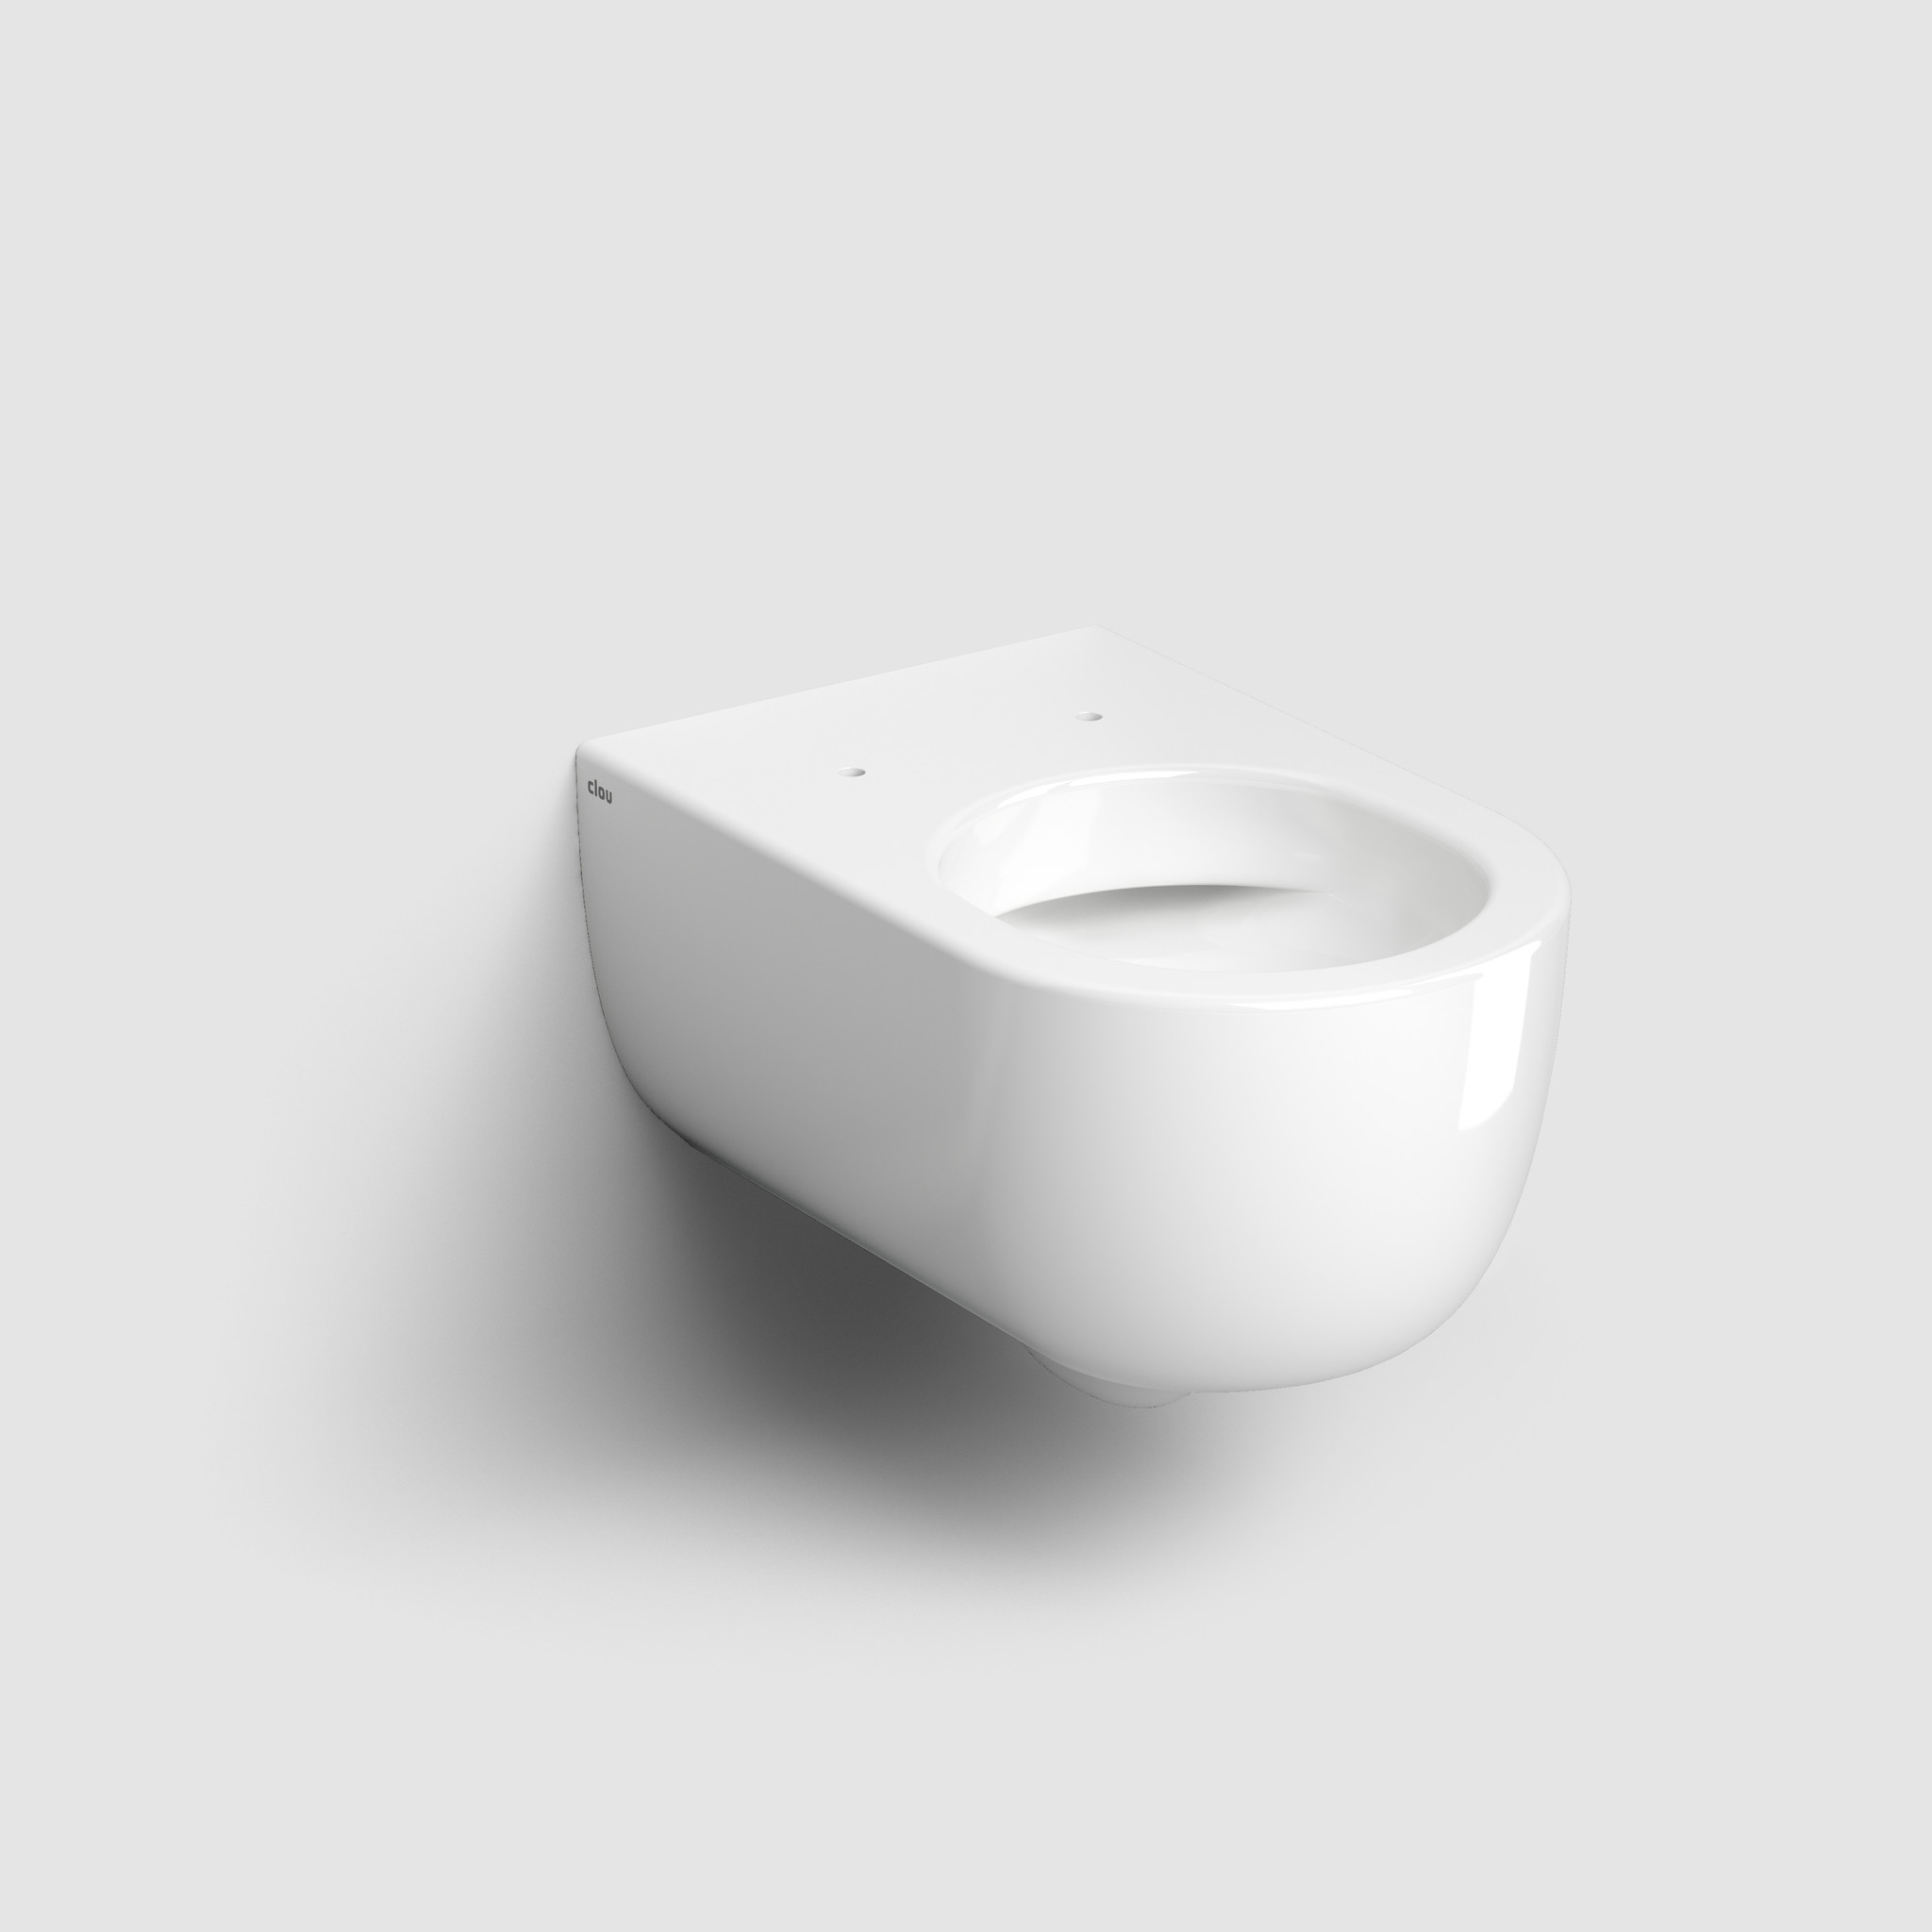 Hammock toilette 56cm sans bord, sans abattant